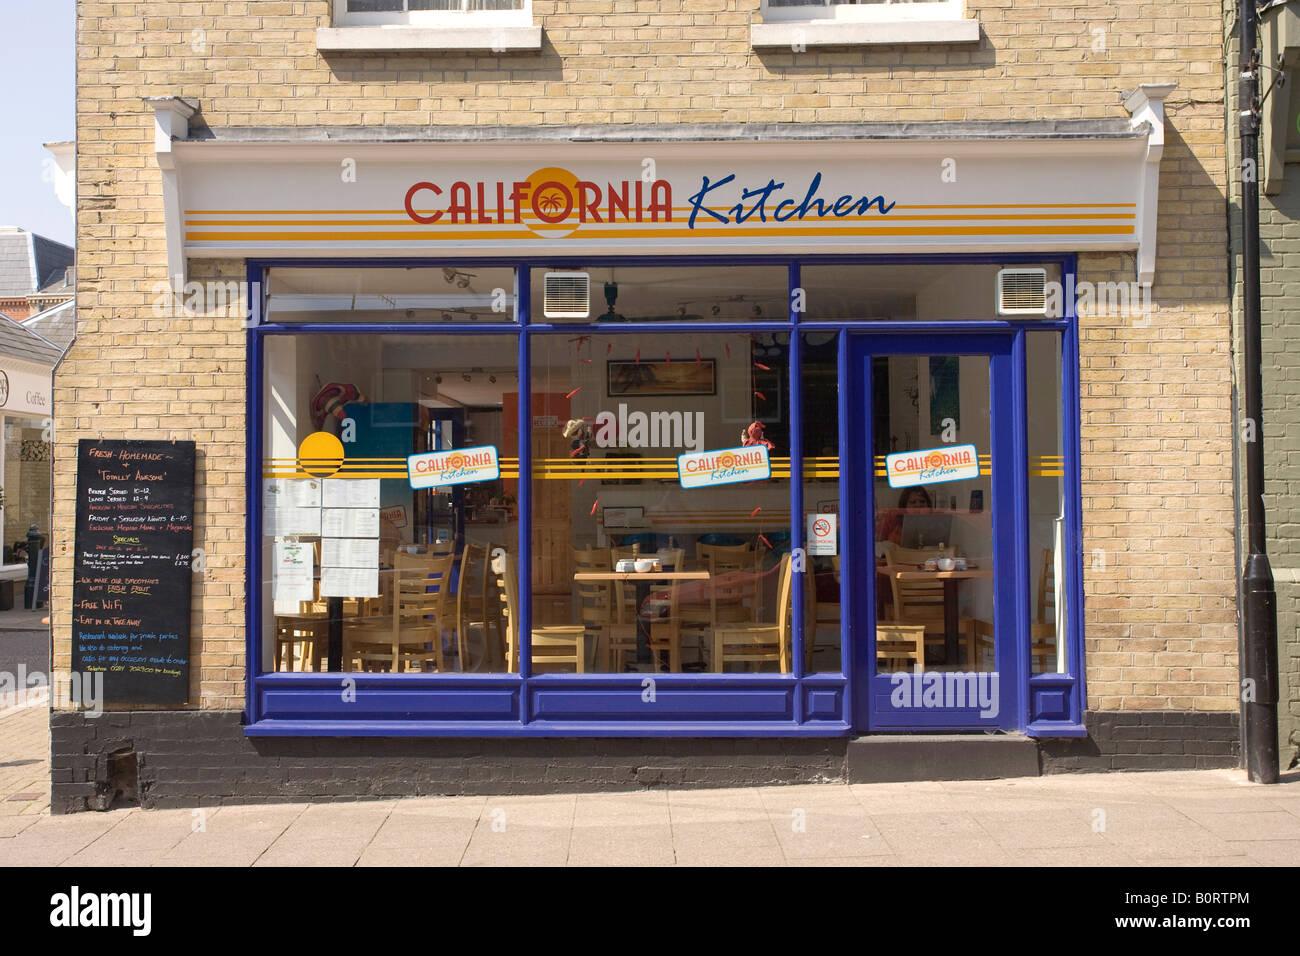 California Kitchen, Californian style restaurant in Bury St Edmunds ...